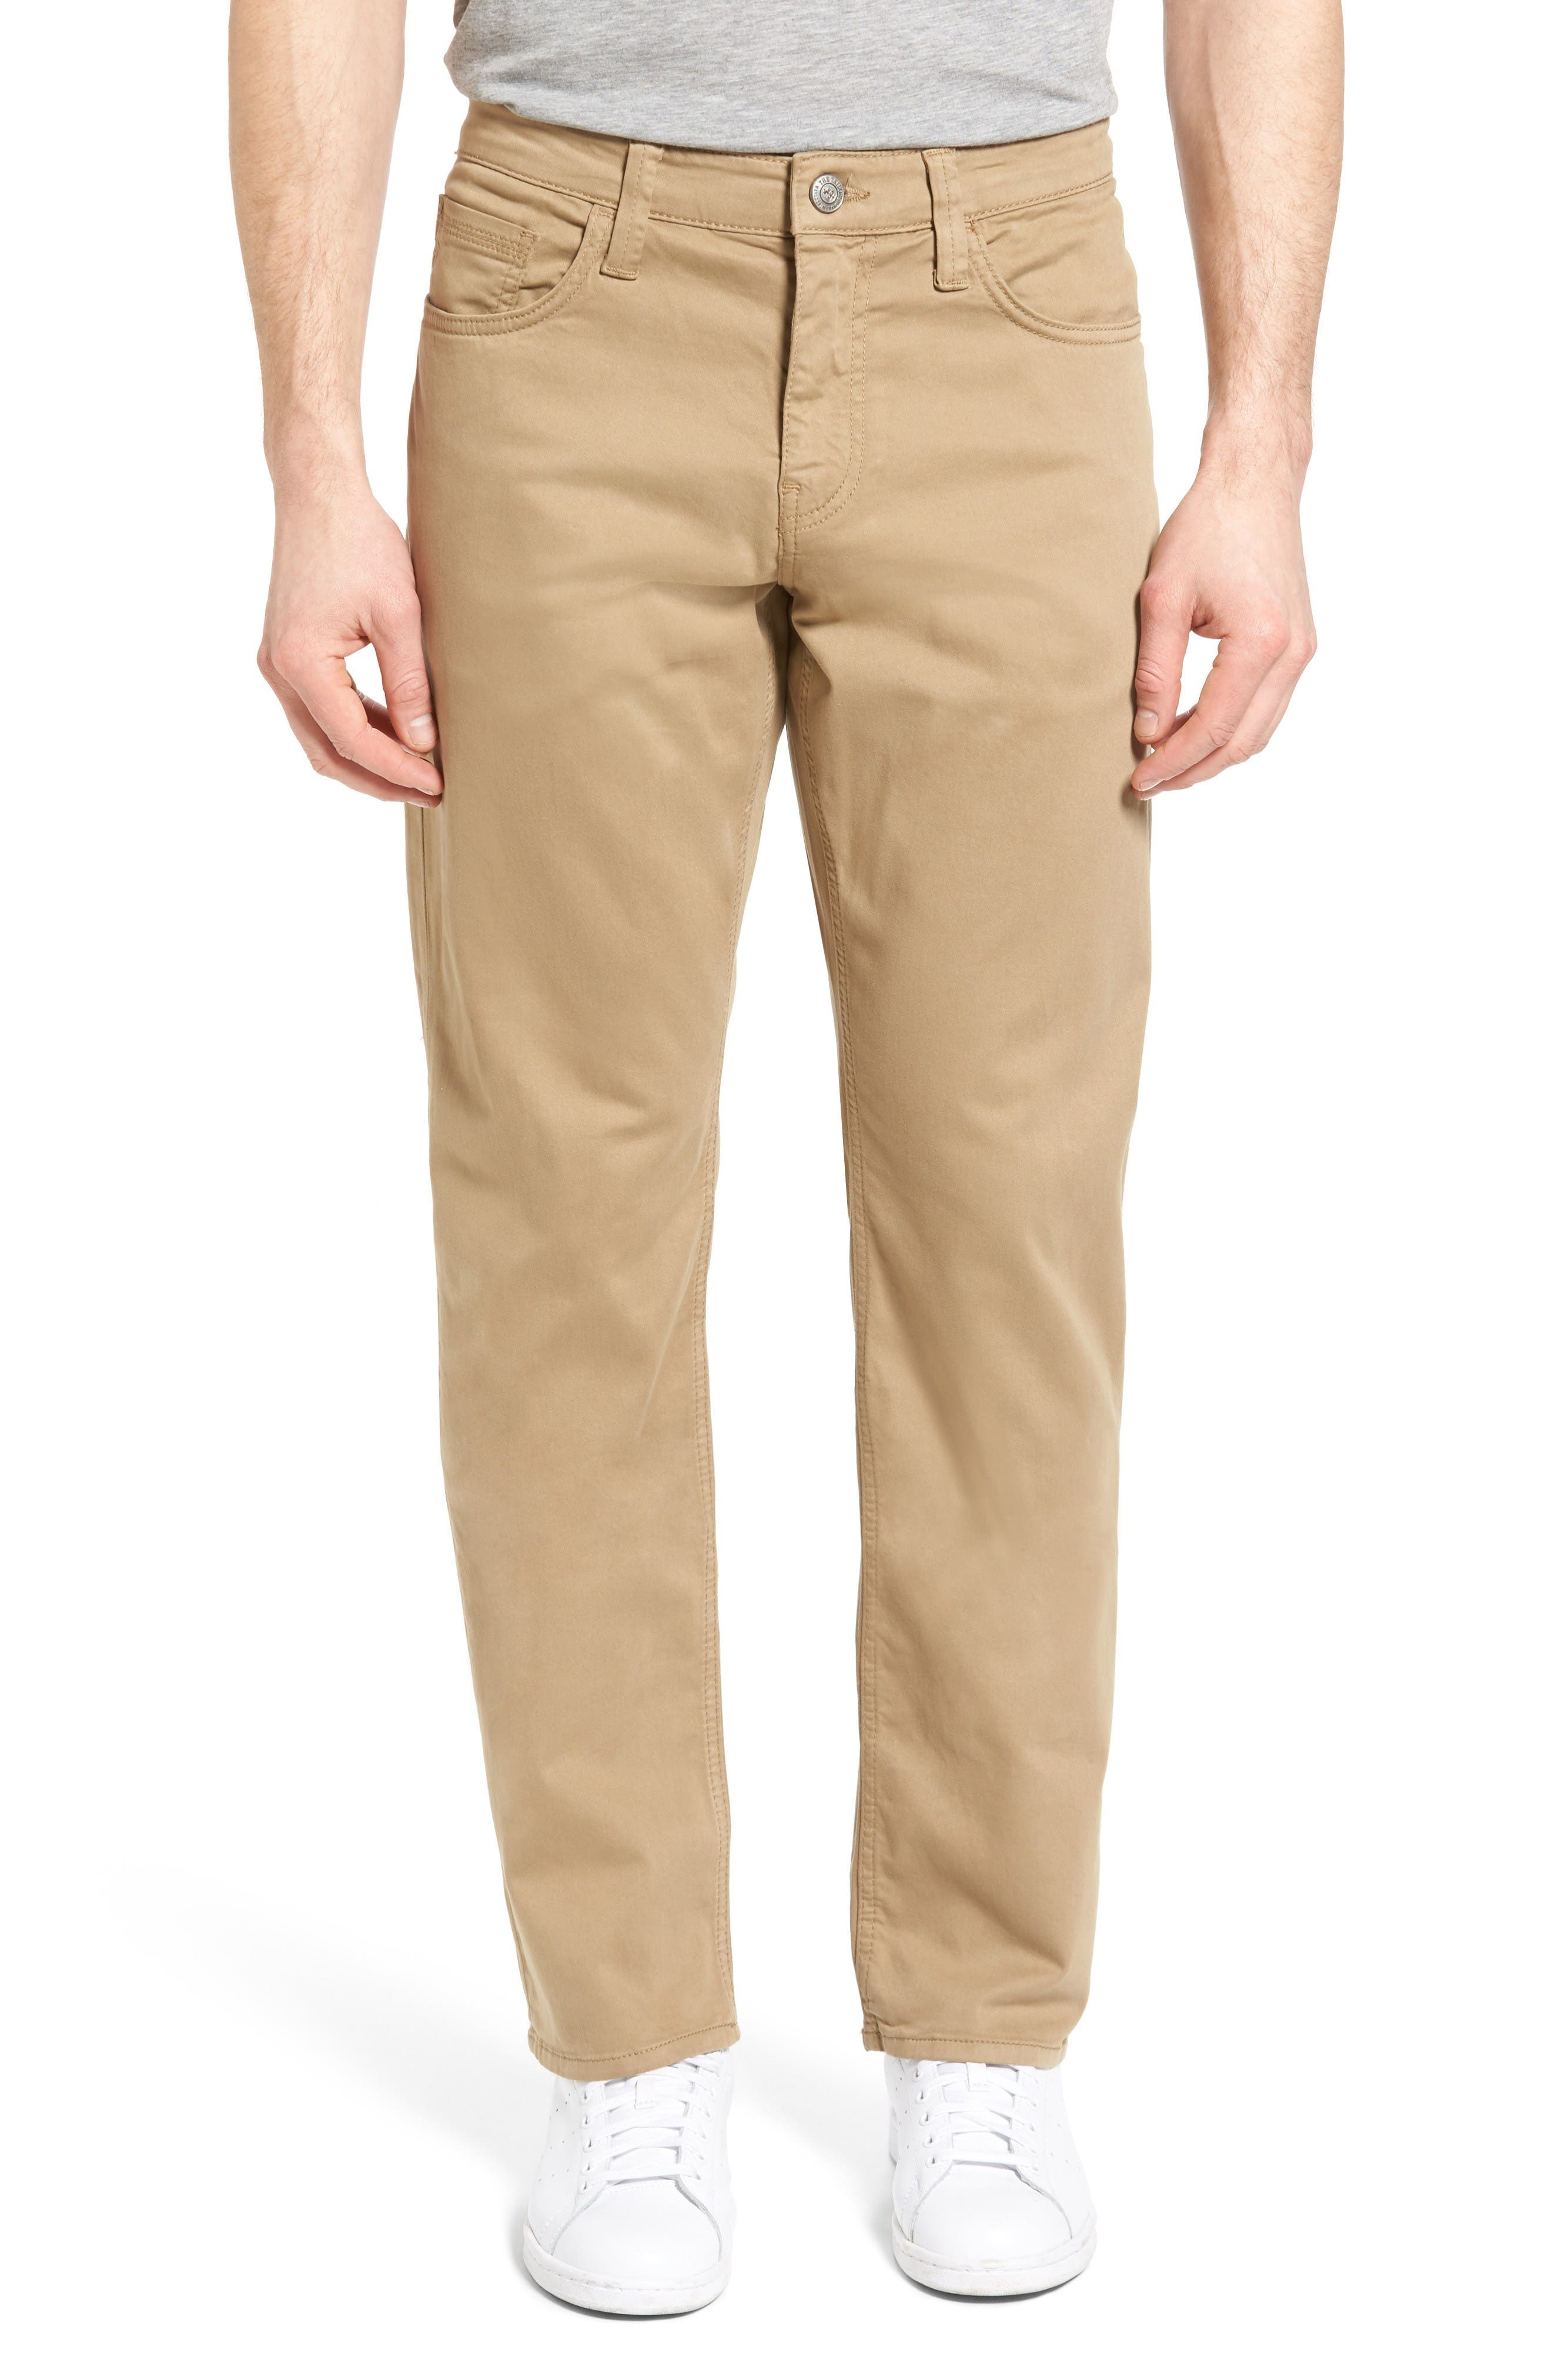 Mavi Jeans Myles Straight Leg Jeans (British Khaki Twill)